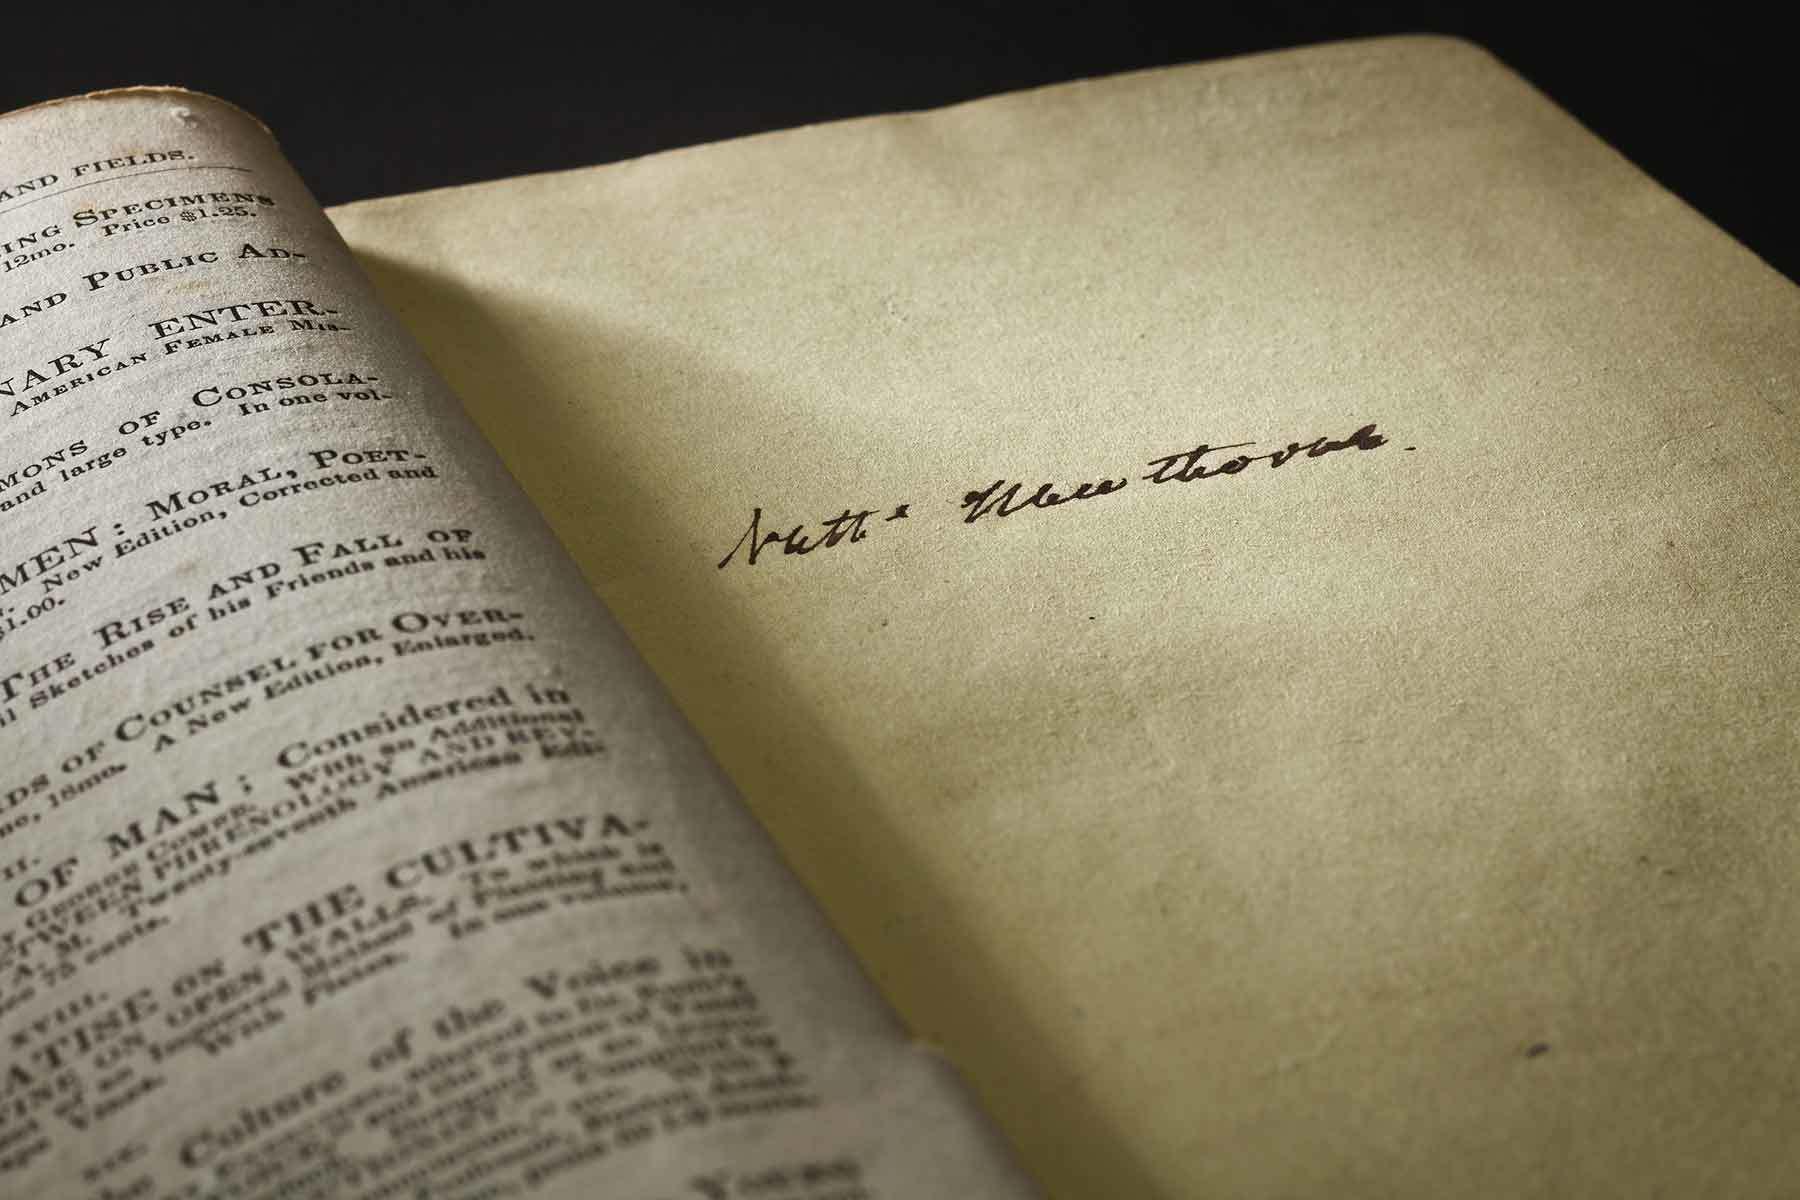 Nathaniel Hawthorne, The Scarlet Letter, ca. 1850